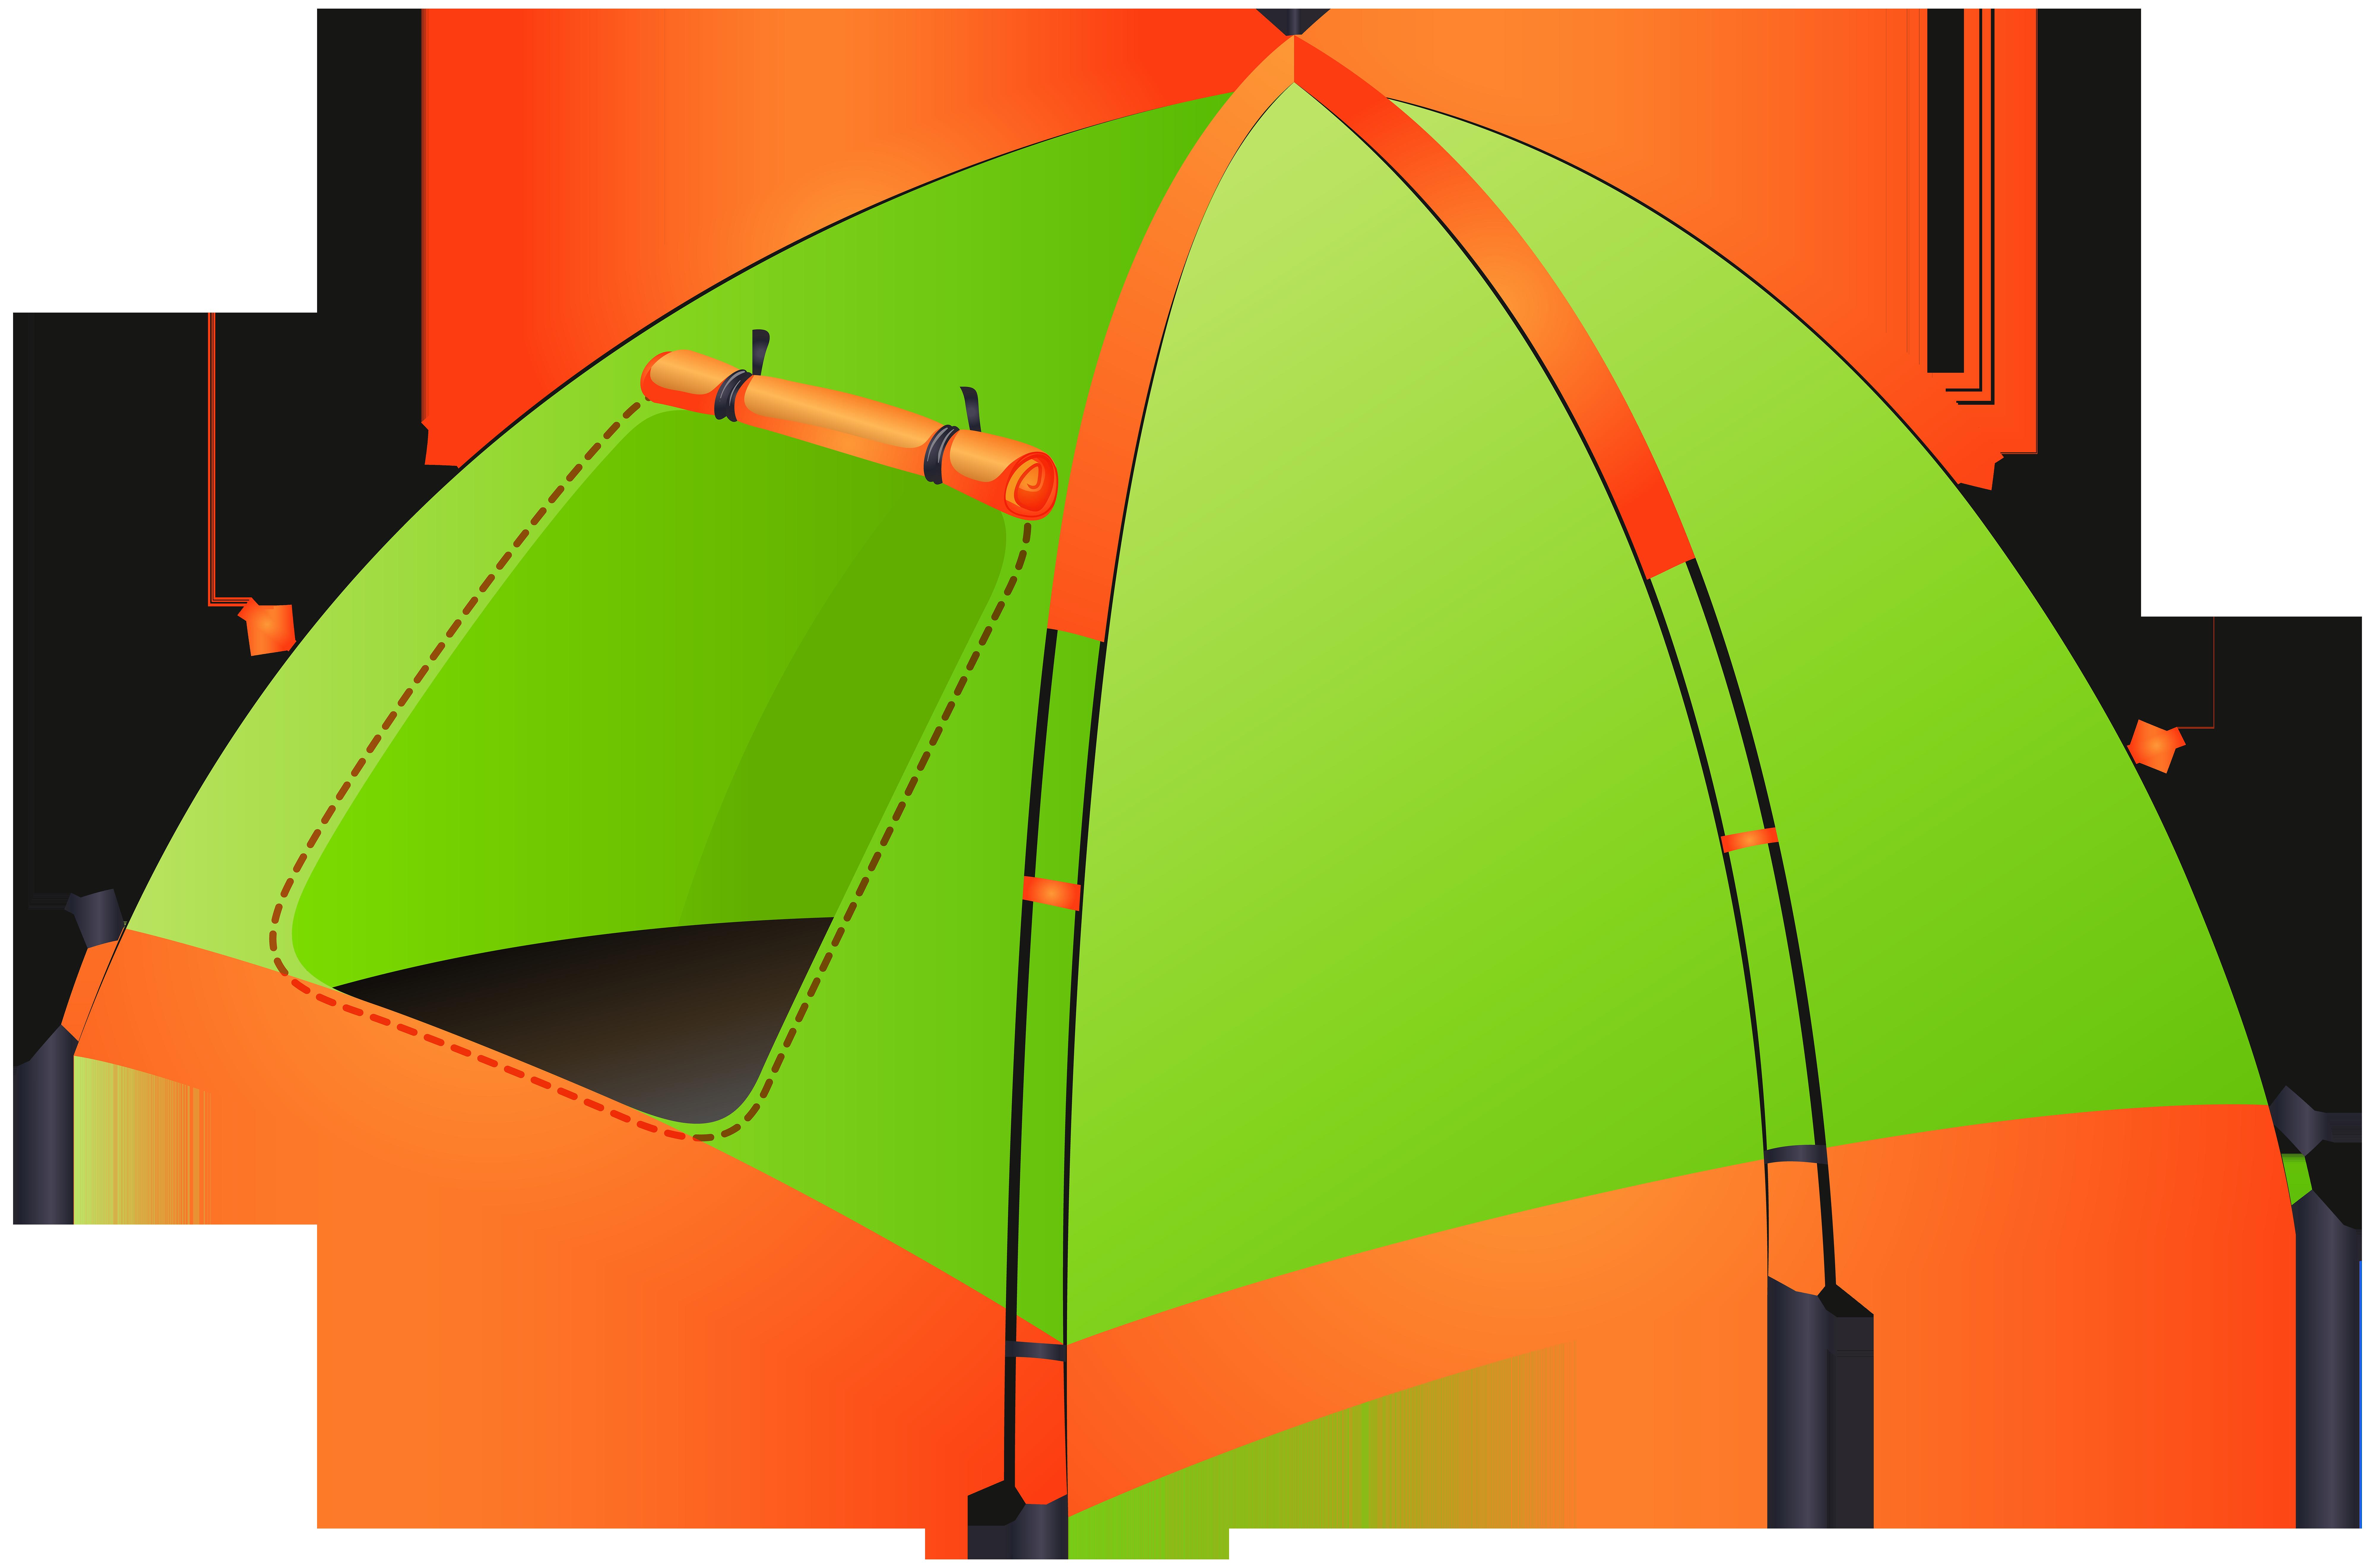 Clipart tent green tent. Image transparent background keysinspectorinc